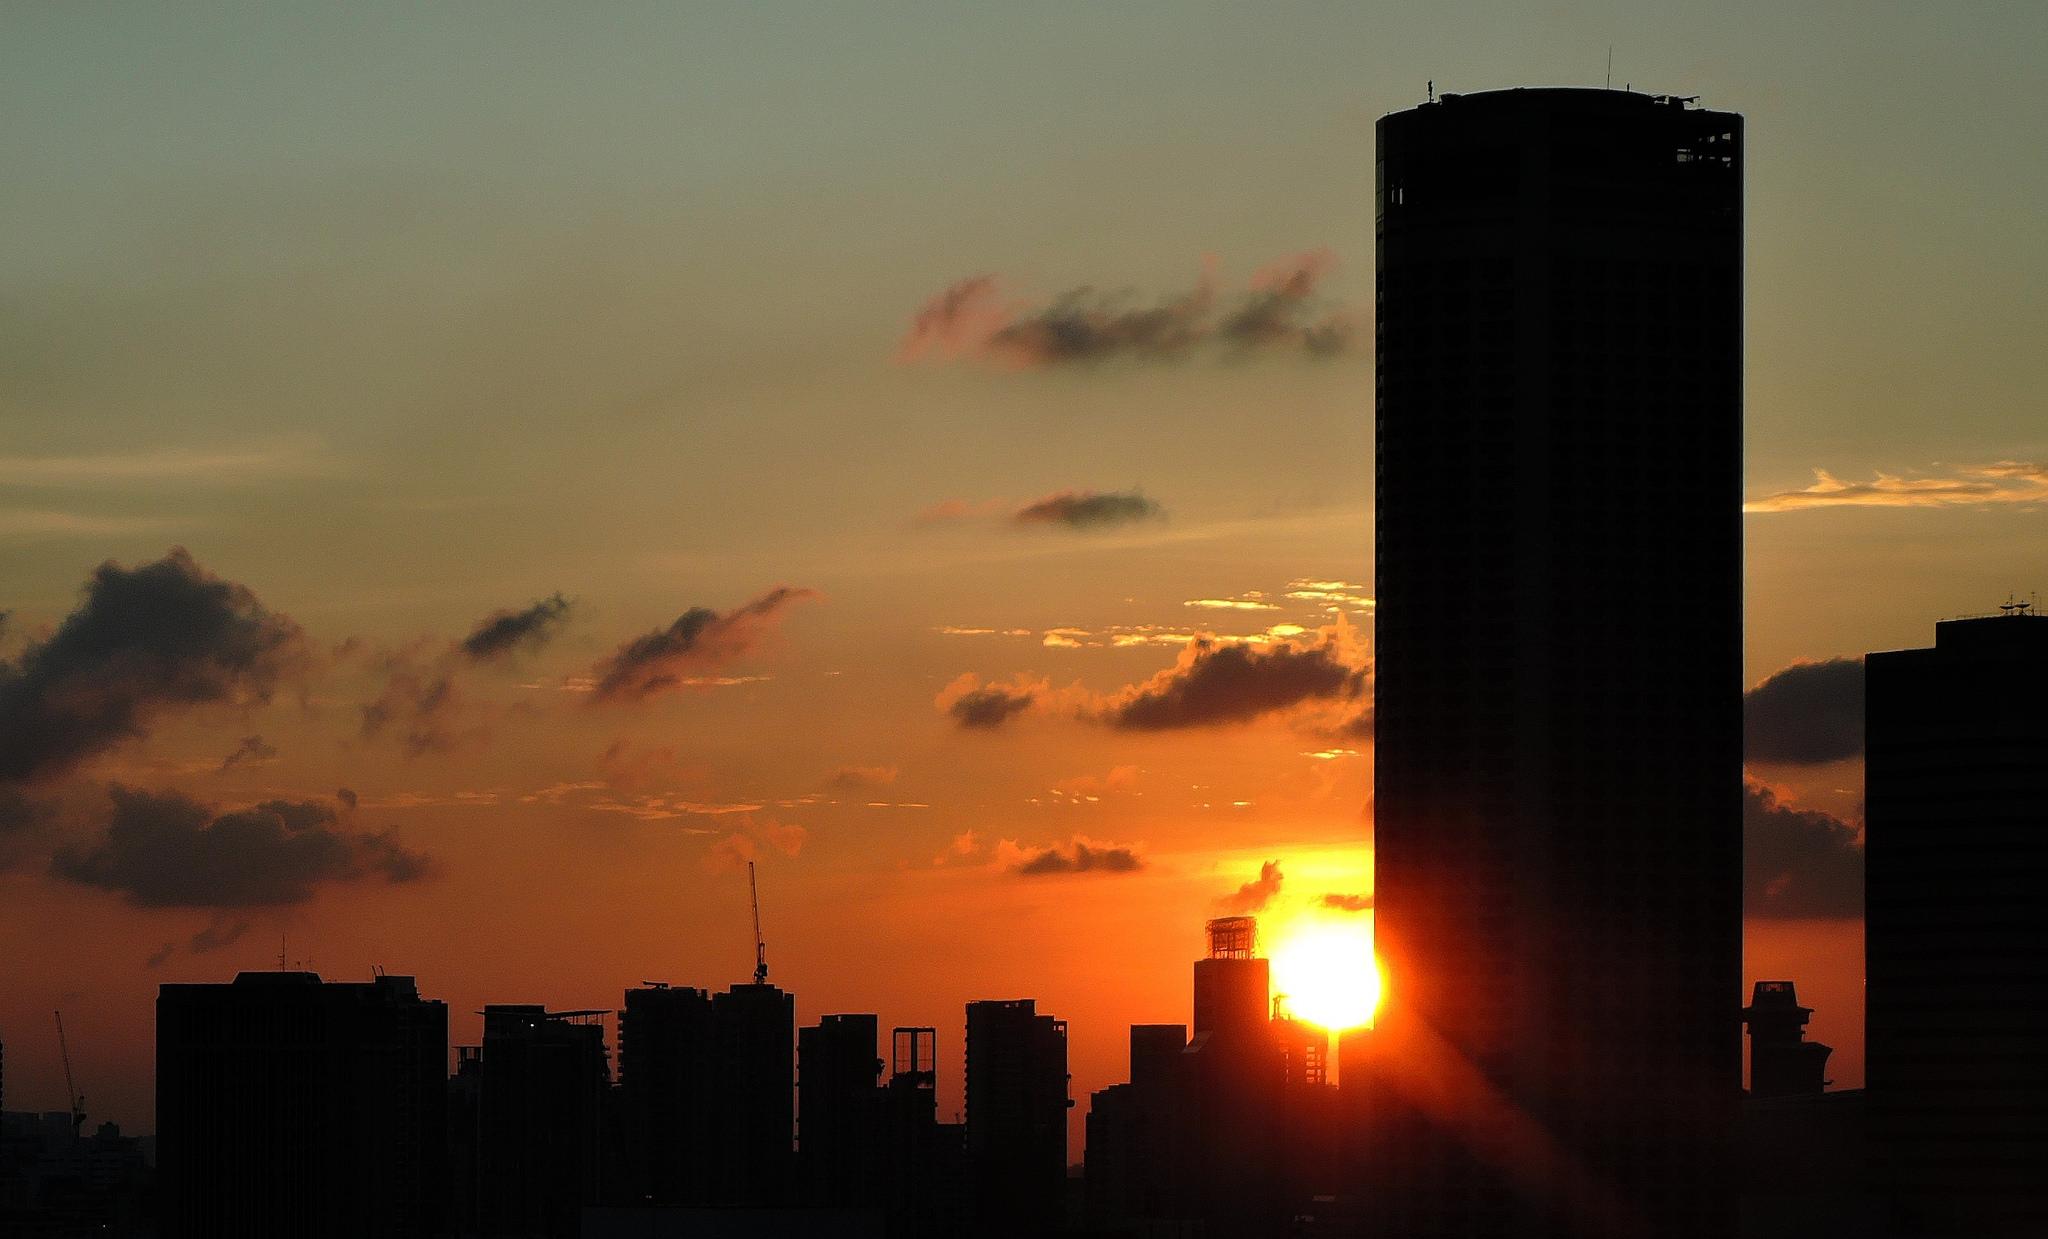 Singapore Sunset Over Skyscrapers   © Gülden Üstün/Flickr